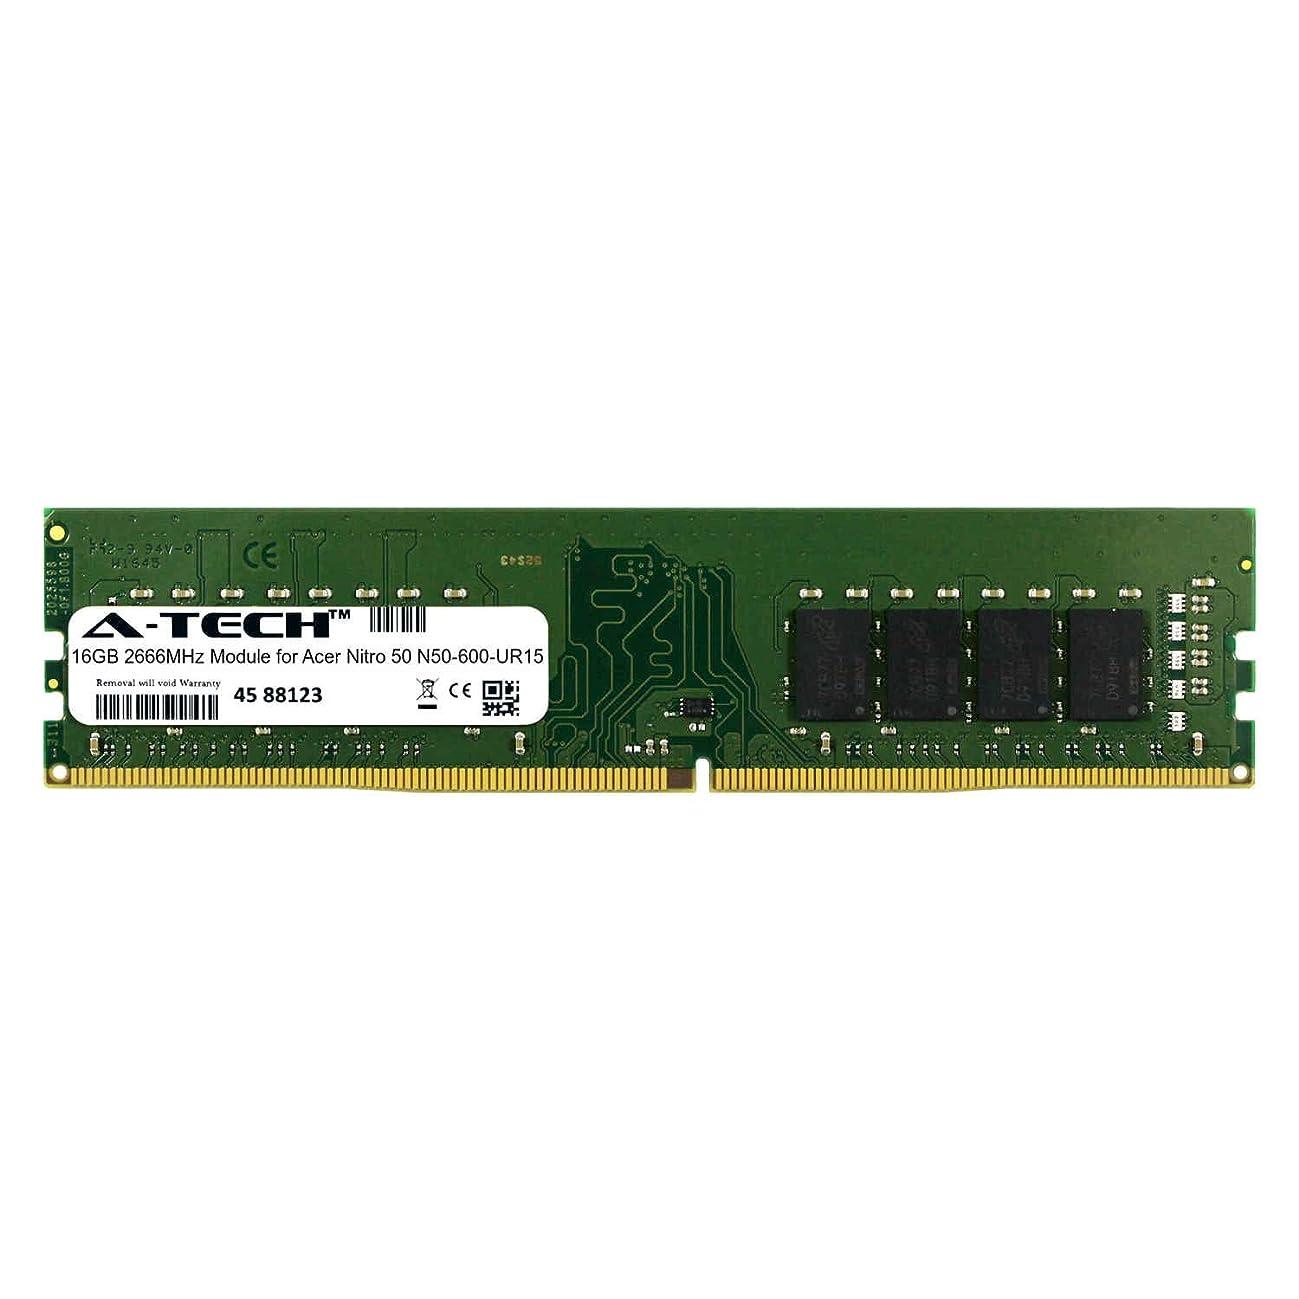 A-Tech 16GB Module for Acer Nitro 50 N50-600-UR15 Desktop & Workstation Motherboard Compatible DDR4 2666Mhz Memory Ram (ATMS279651A25823X1)